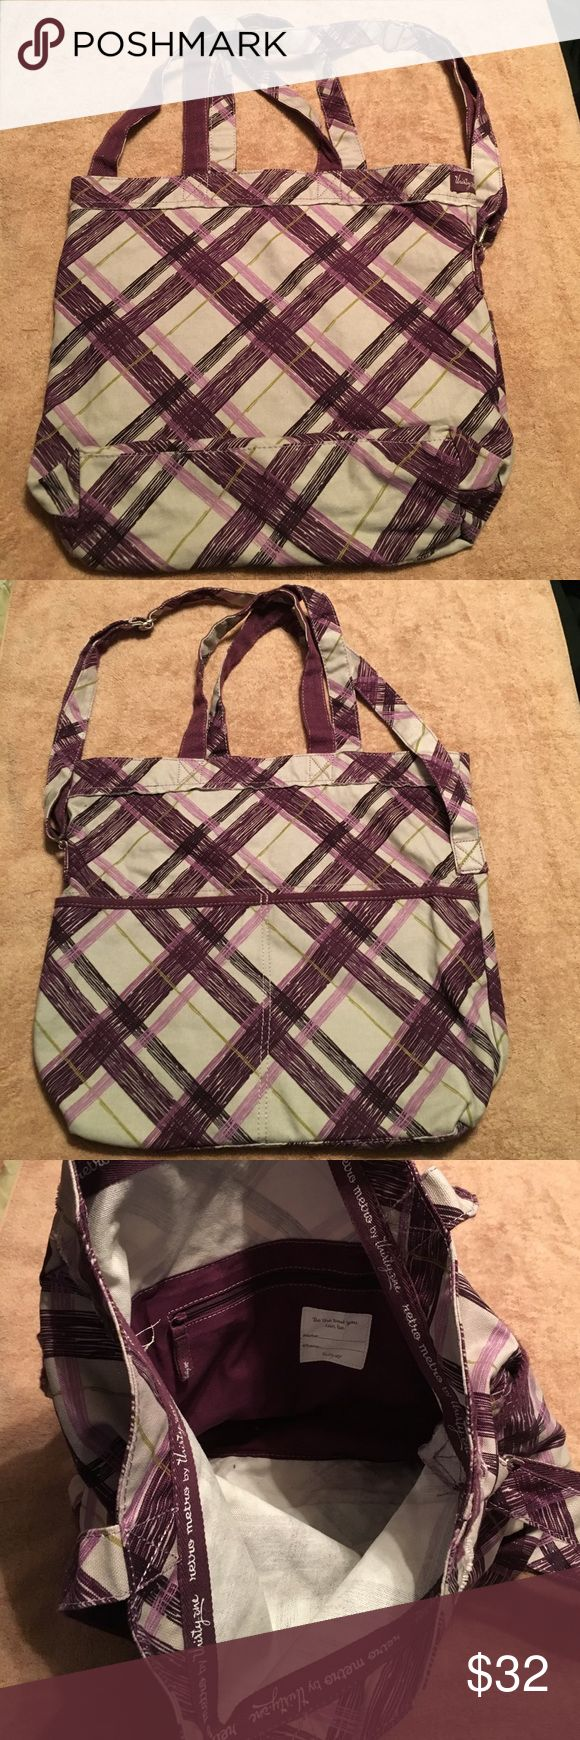 Thirty-One retro metro bag Never used retro metro bag, very nice big bag! Thirty One Bags